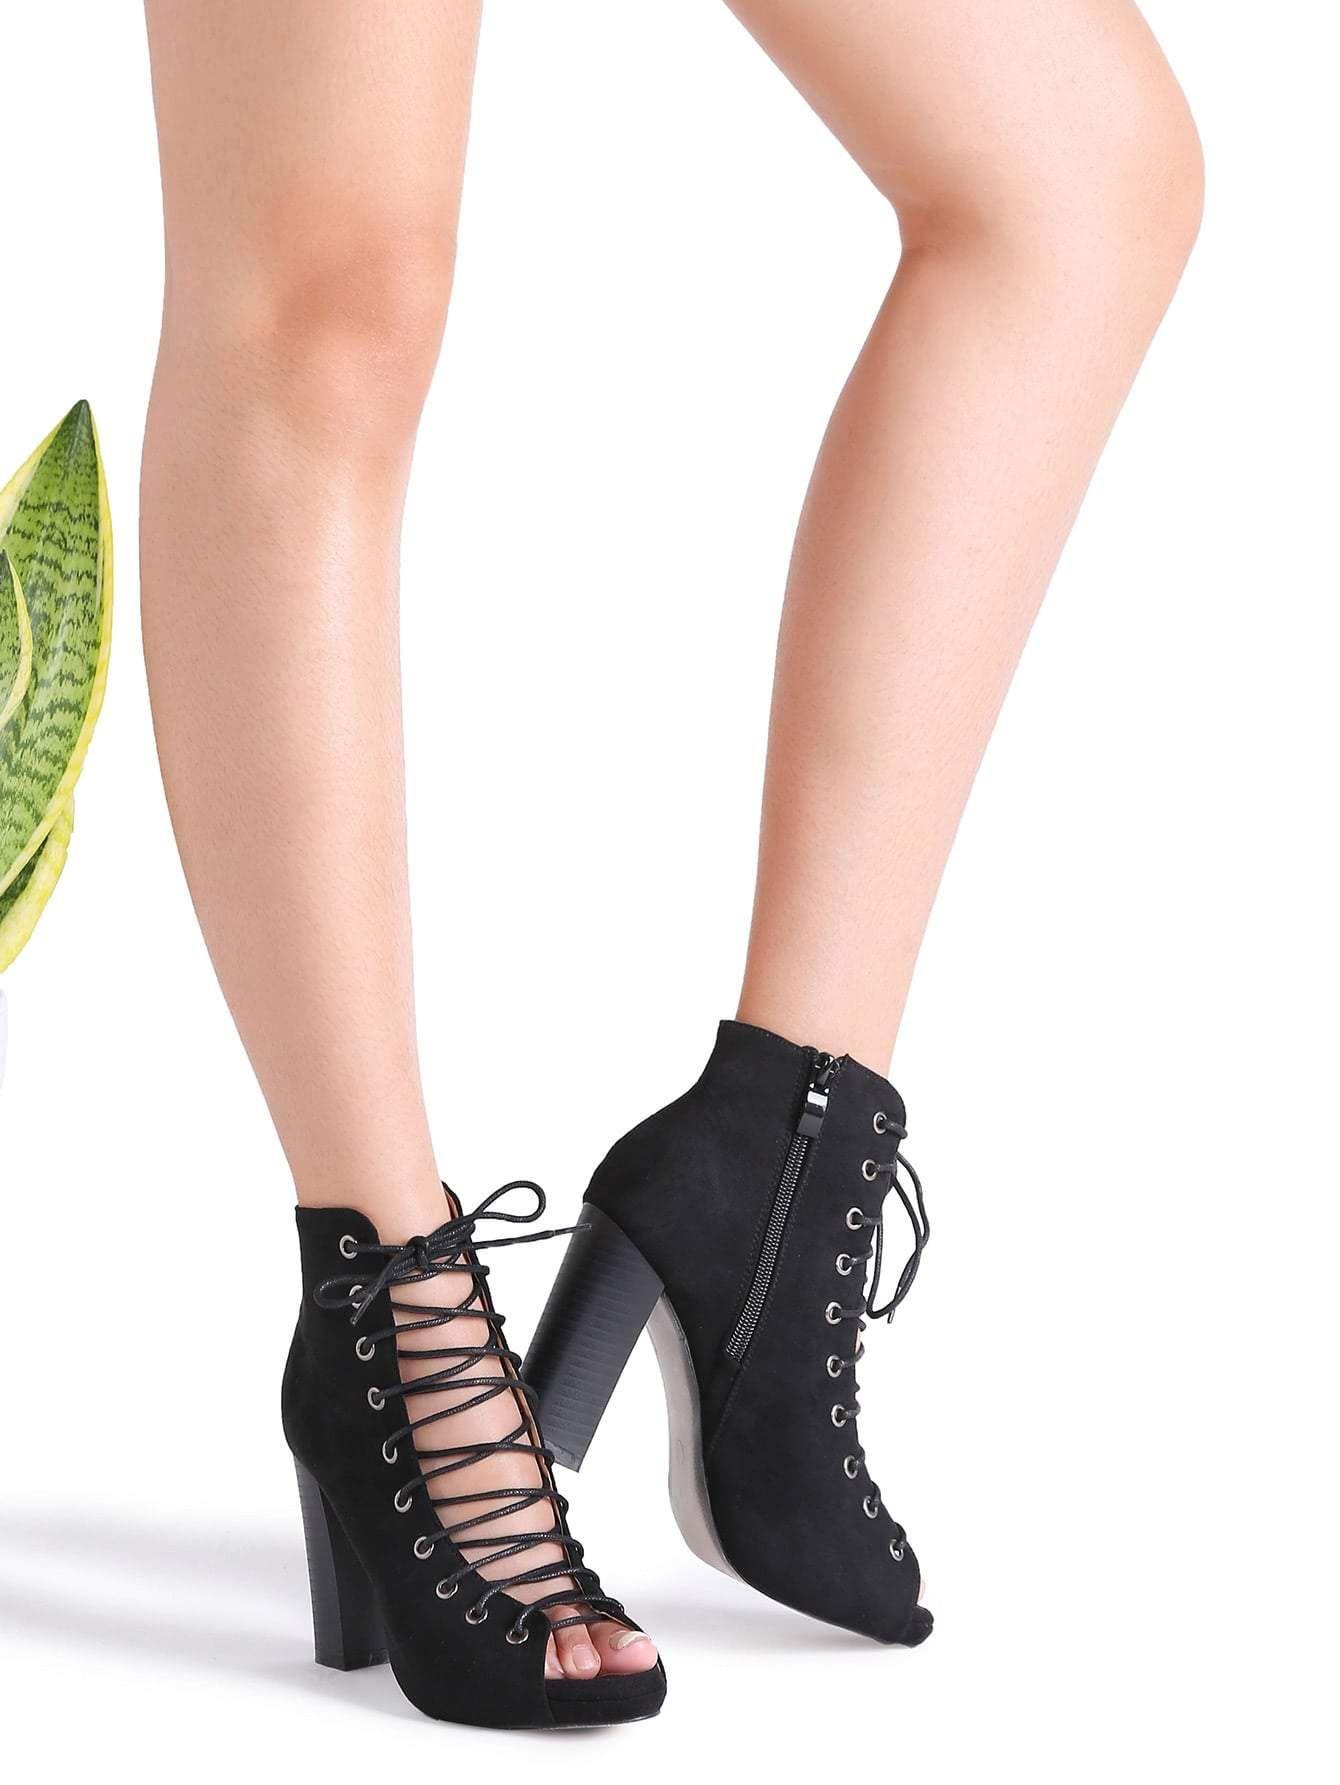 cf9e8a1e761 black cutout crisscross side zipper sandals.  heels  shoes  women  fashion